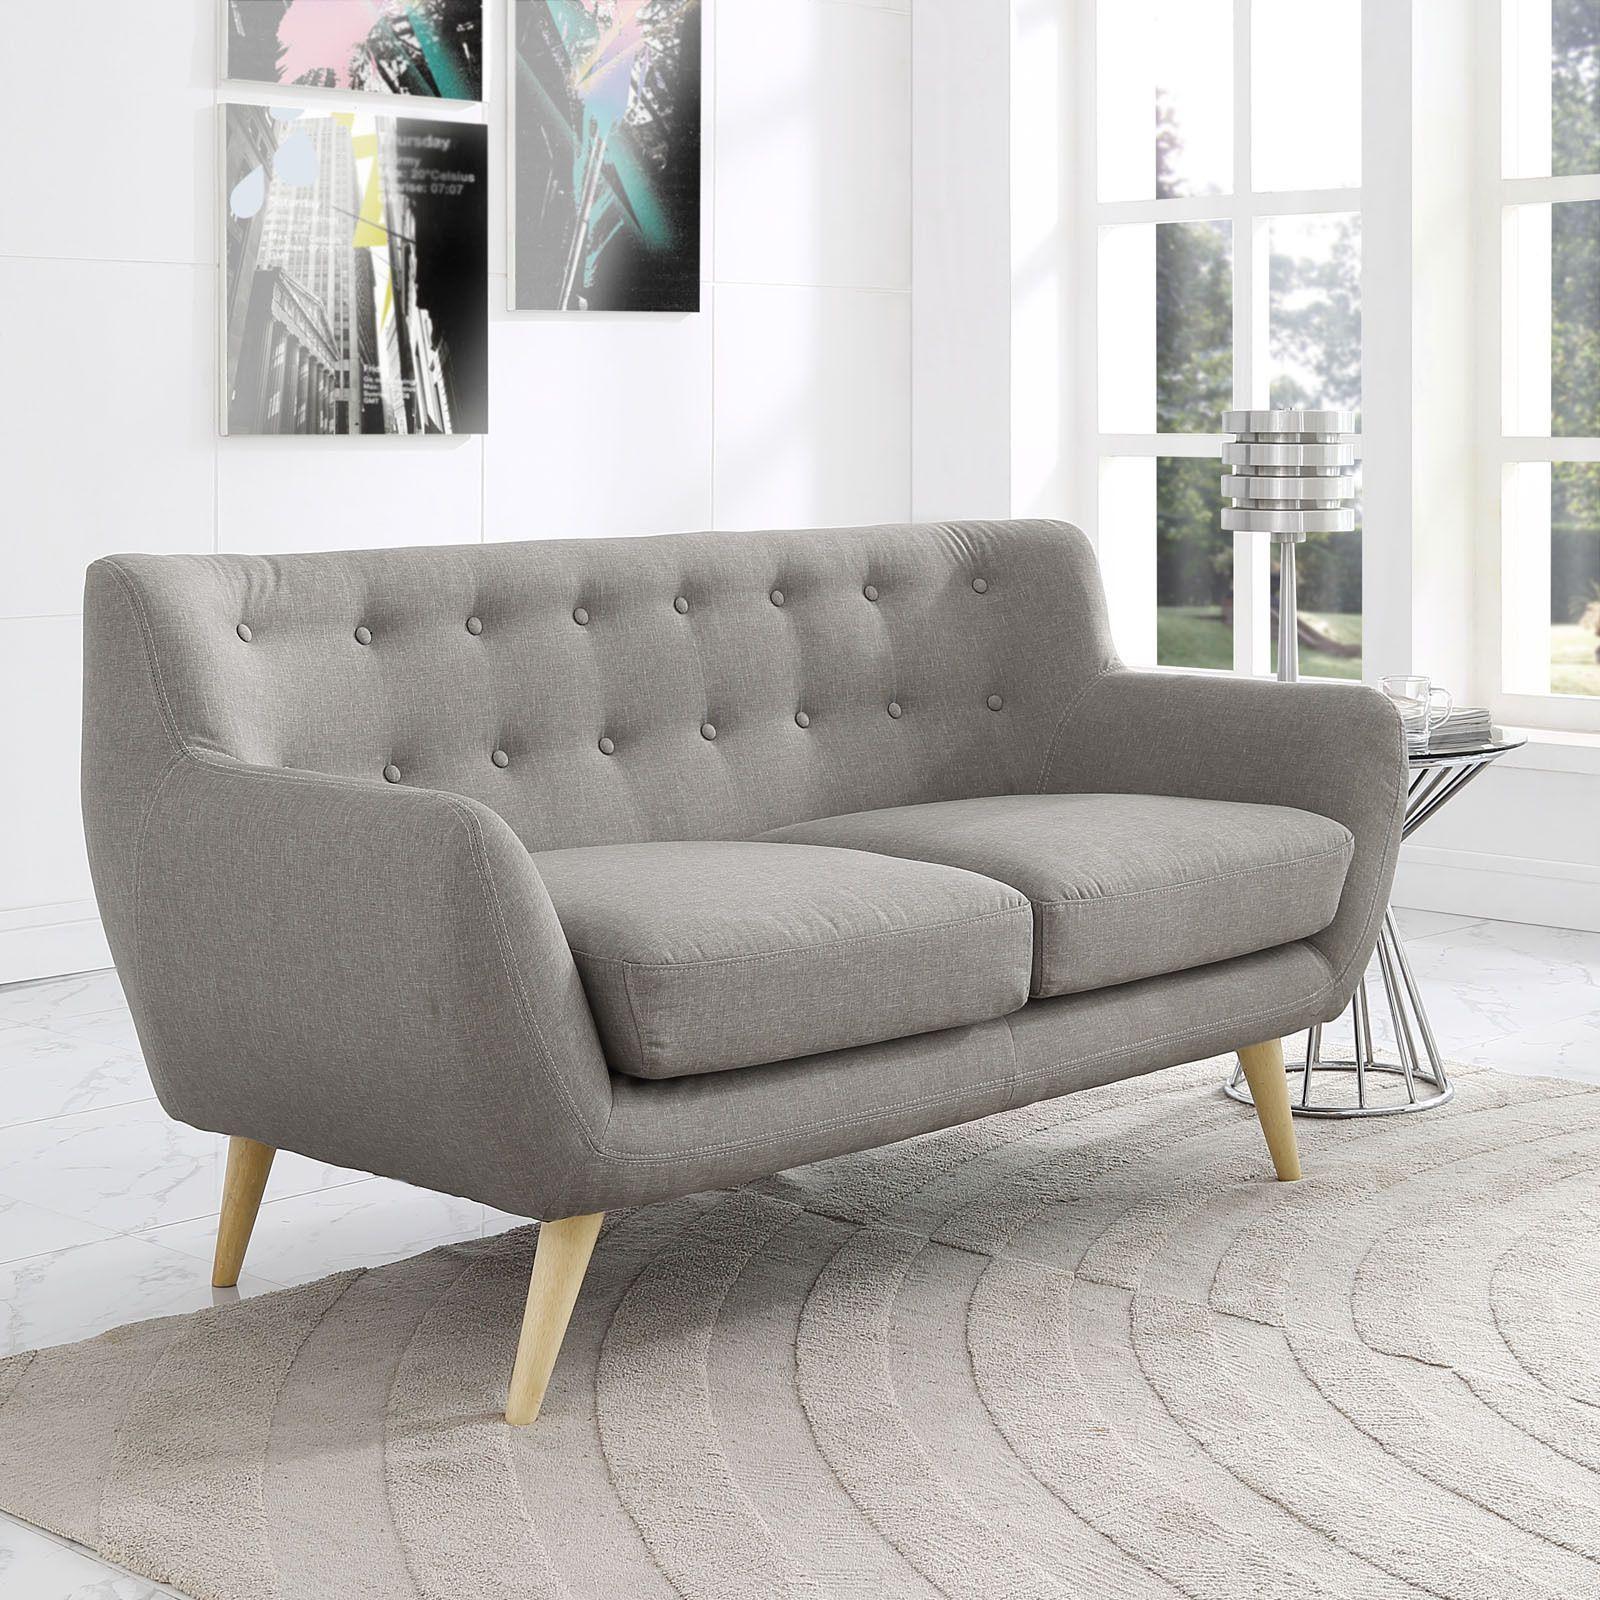 Cool This Elegant Modern Loveseat Will Bring Plush Comfort To Ibusinesslaw Wood Chair Design Ideas Ibusinesslaworg